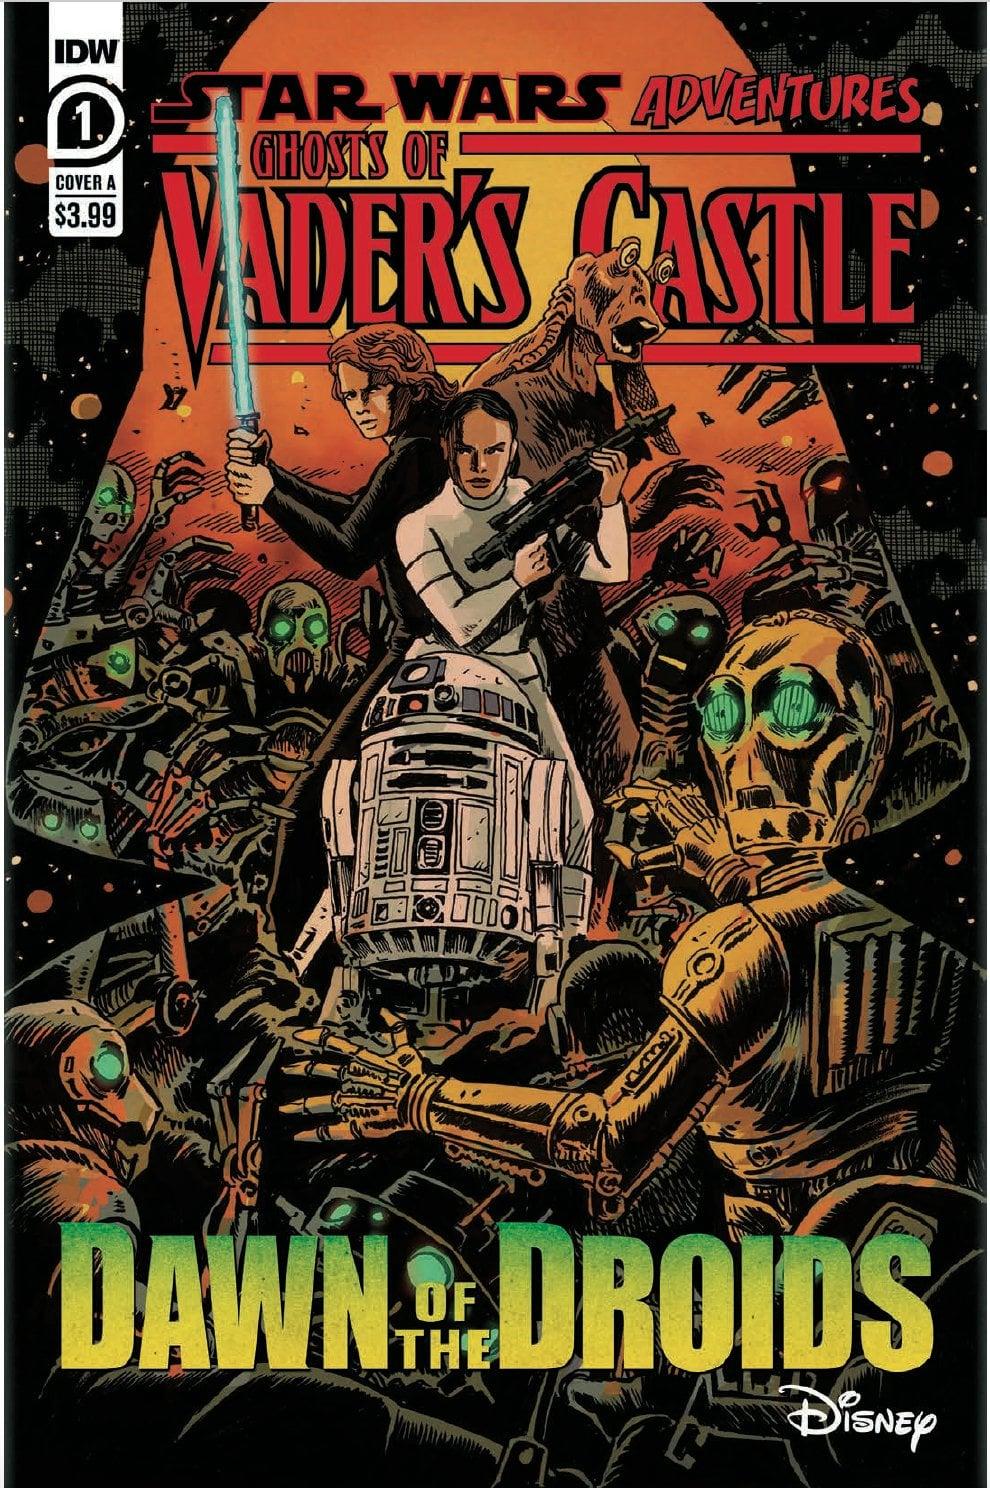 Star Wars Adventures: Ghosts of Vader's Castle 1